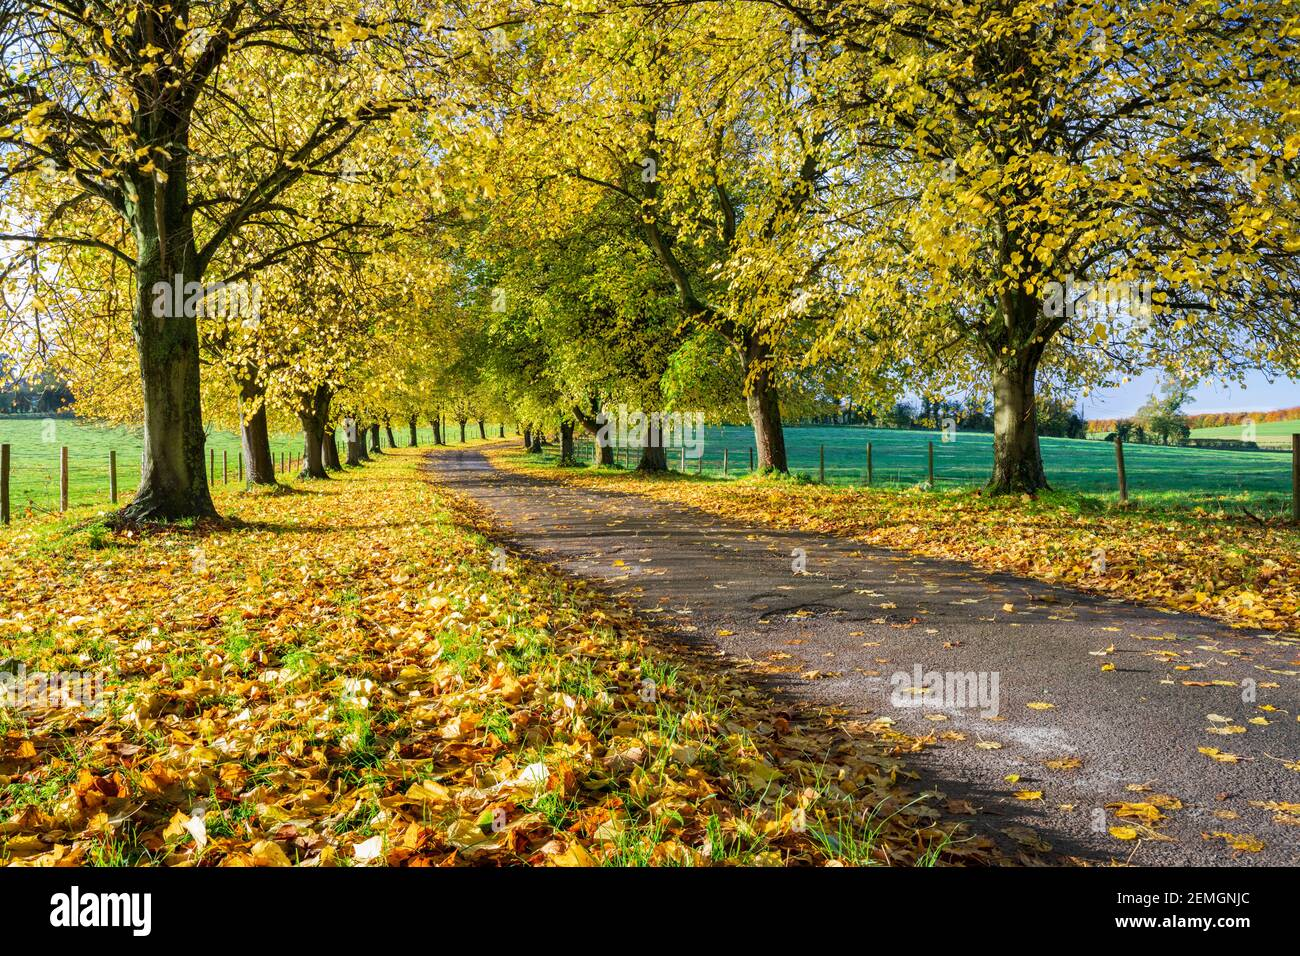 Avenue of autumn beech trees with colourful yellow leaves, Newbury, Berkshire, England, United Kingdom, Europe Stock Photo